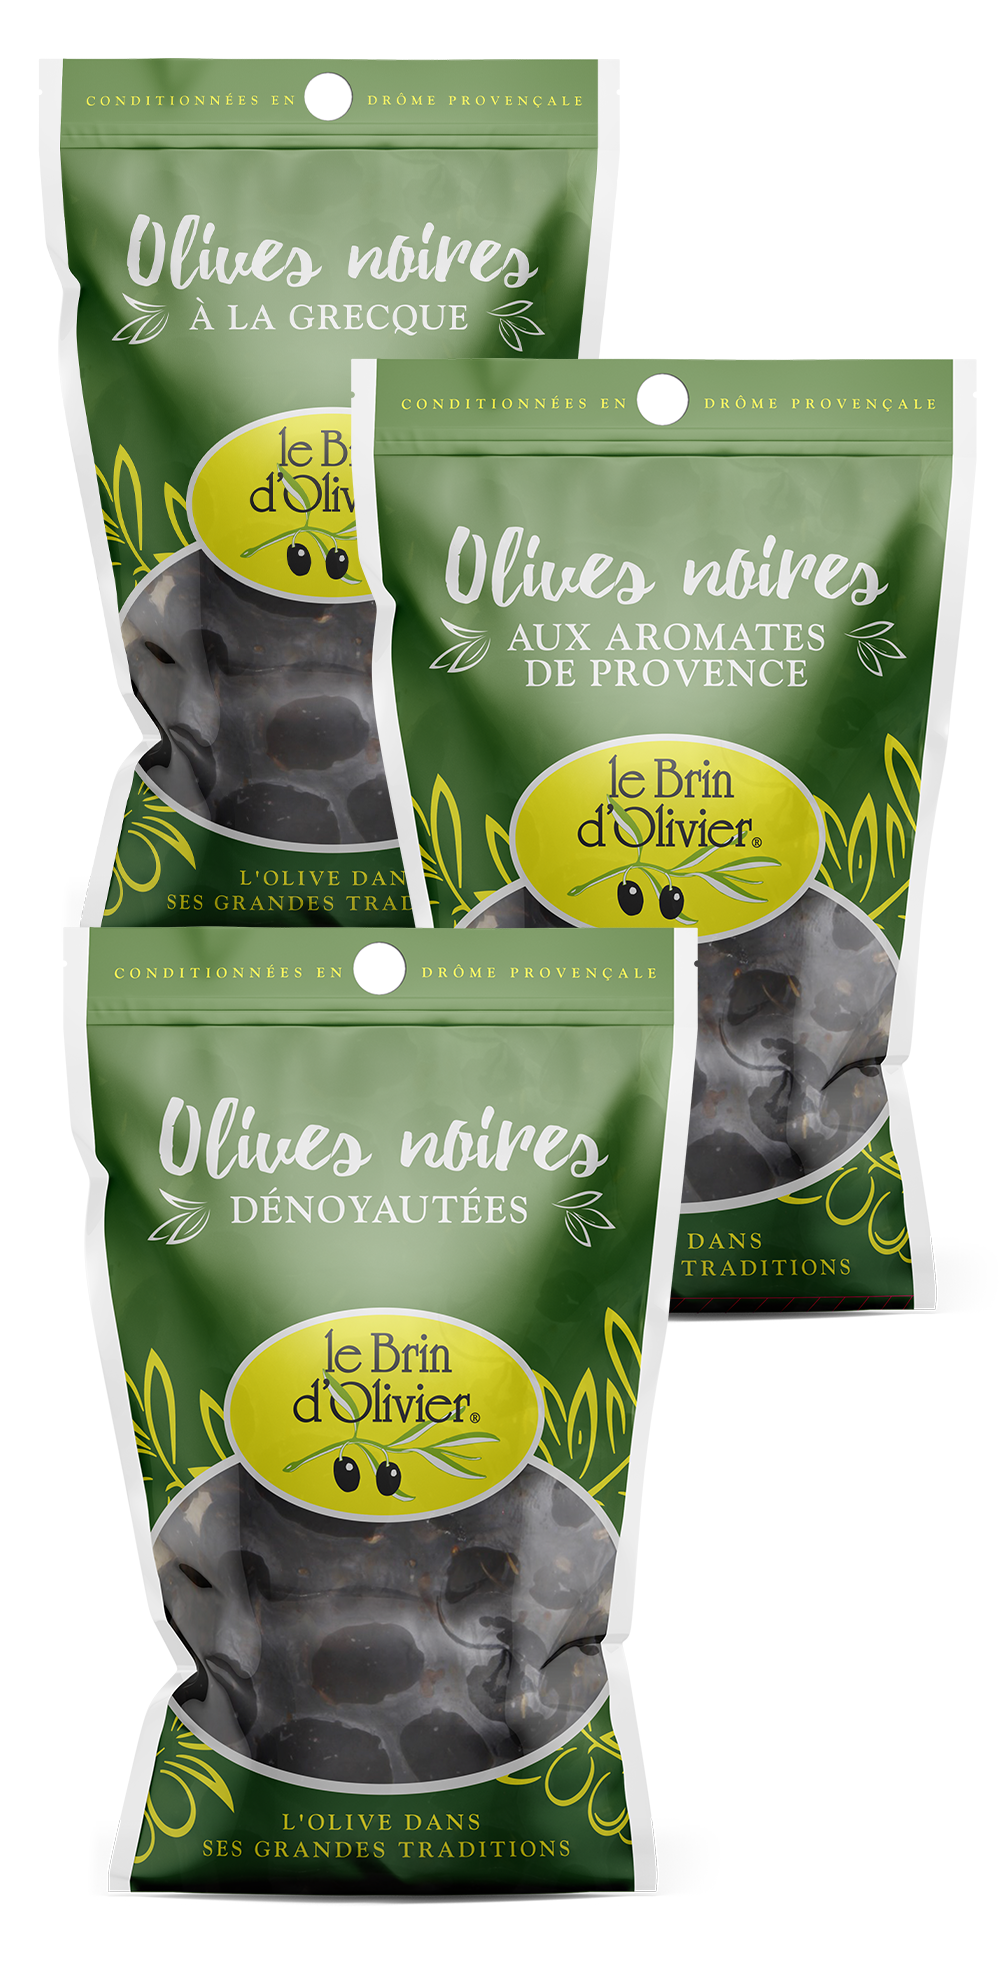 Olives noires de Nyons - Le Brin d'Olivier